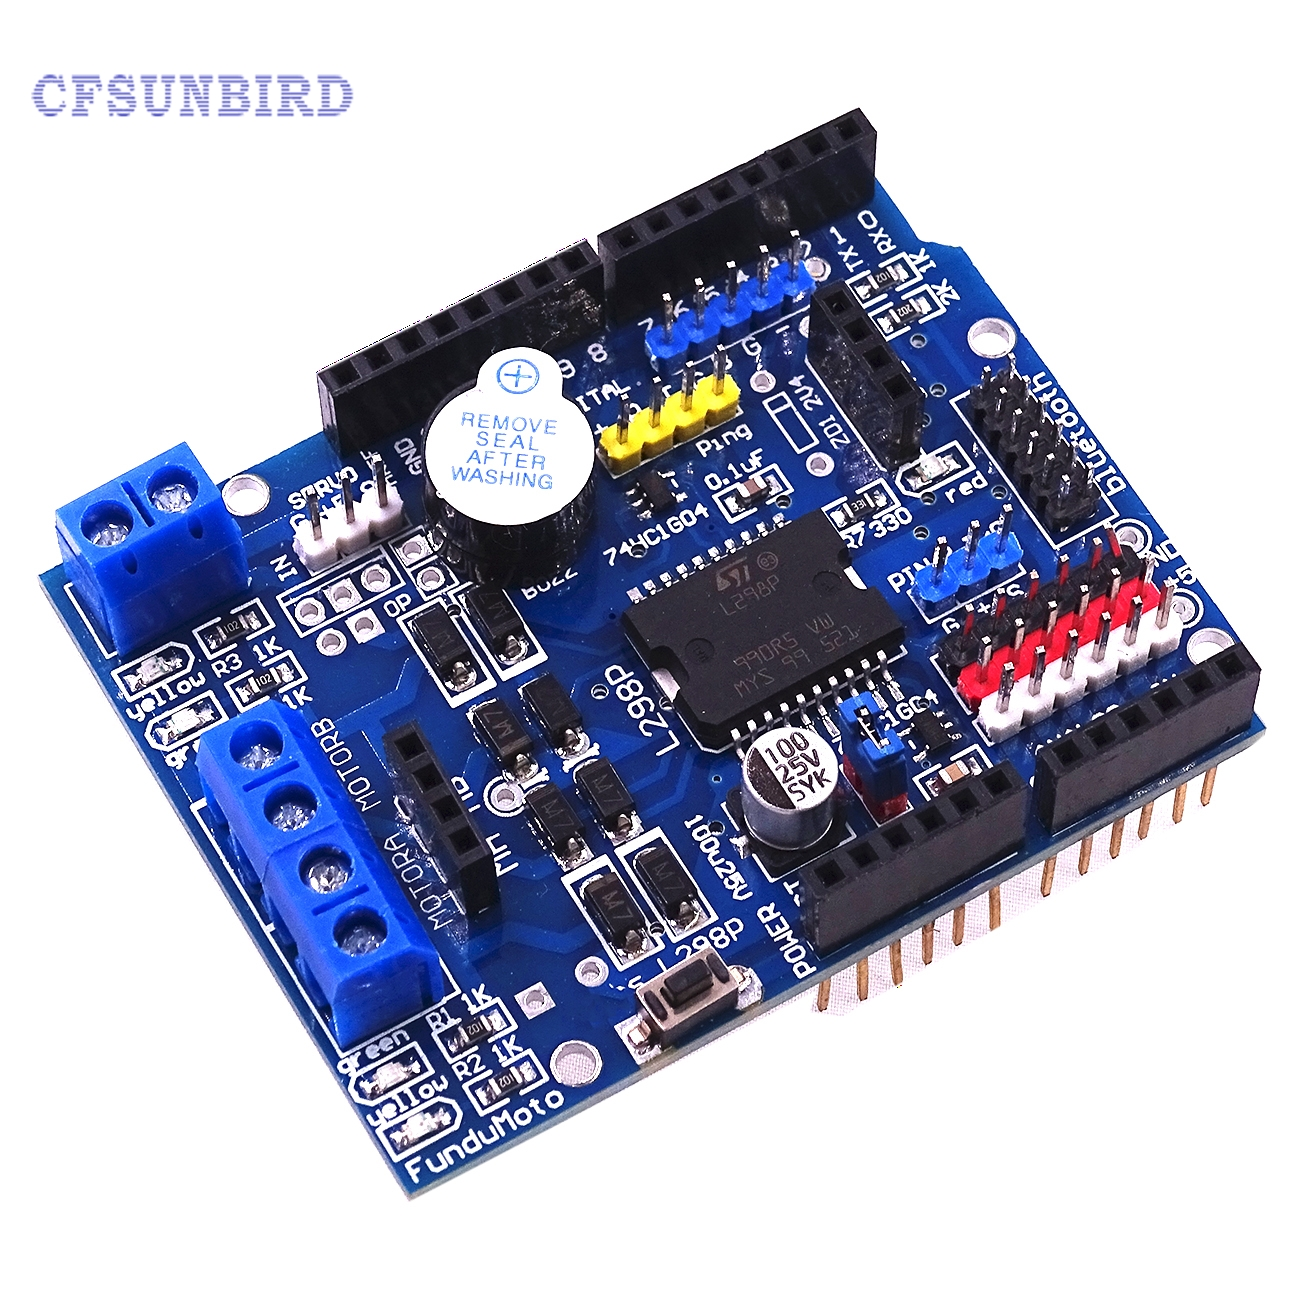 L298P PWM Speed Controller Dual High-Power H-bridge Driver ,Bluetooth Interface, L298P Motor Shield Board for Arduino  dc 12v 24v 36v 2 way pwm motor driver board module 450w high power controller